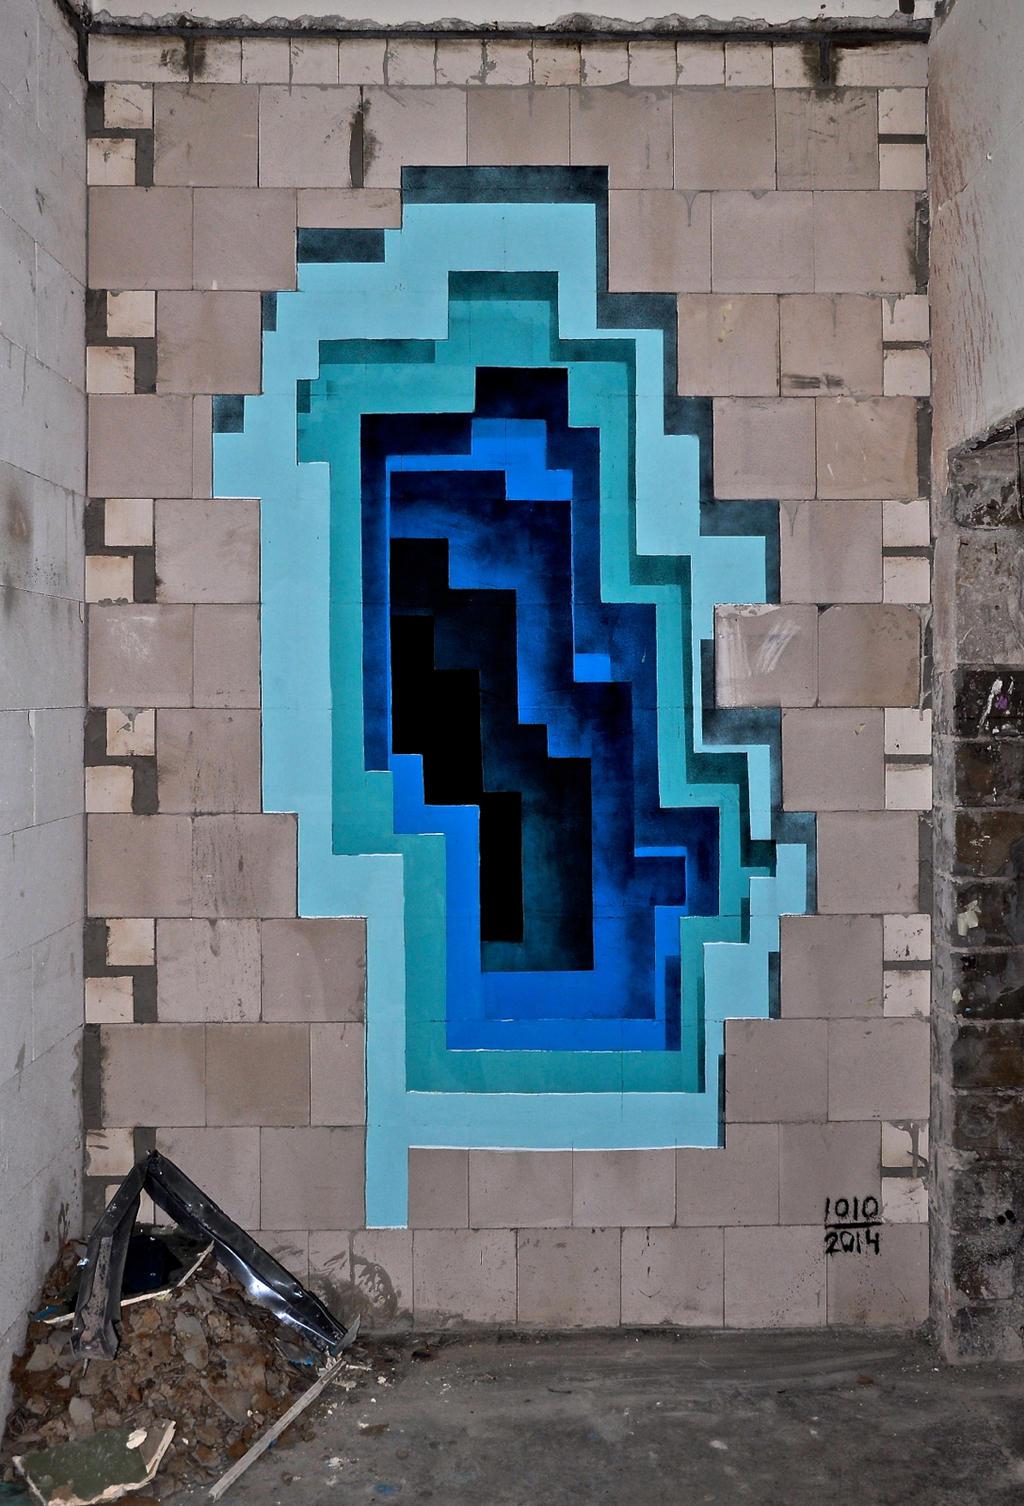 Graffiti 2853 by cmdpirxII